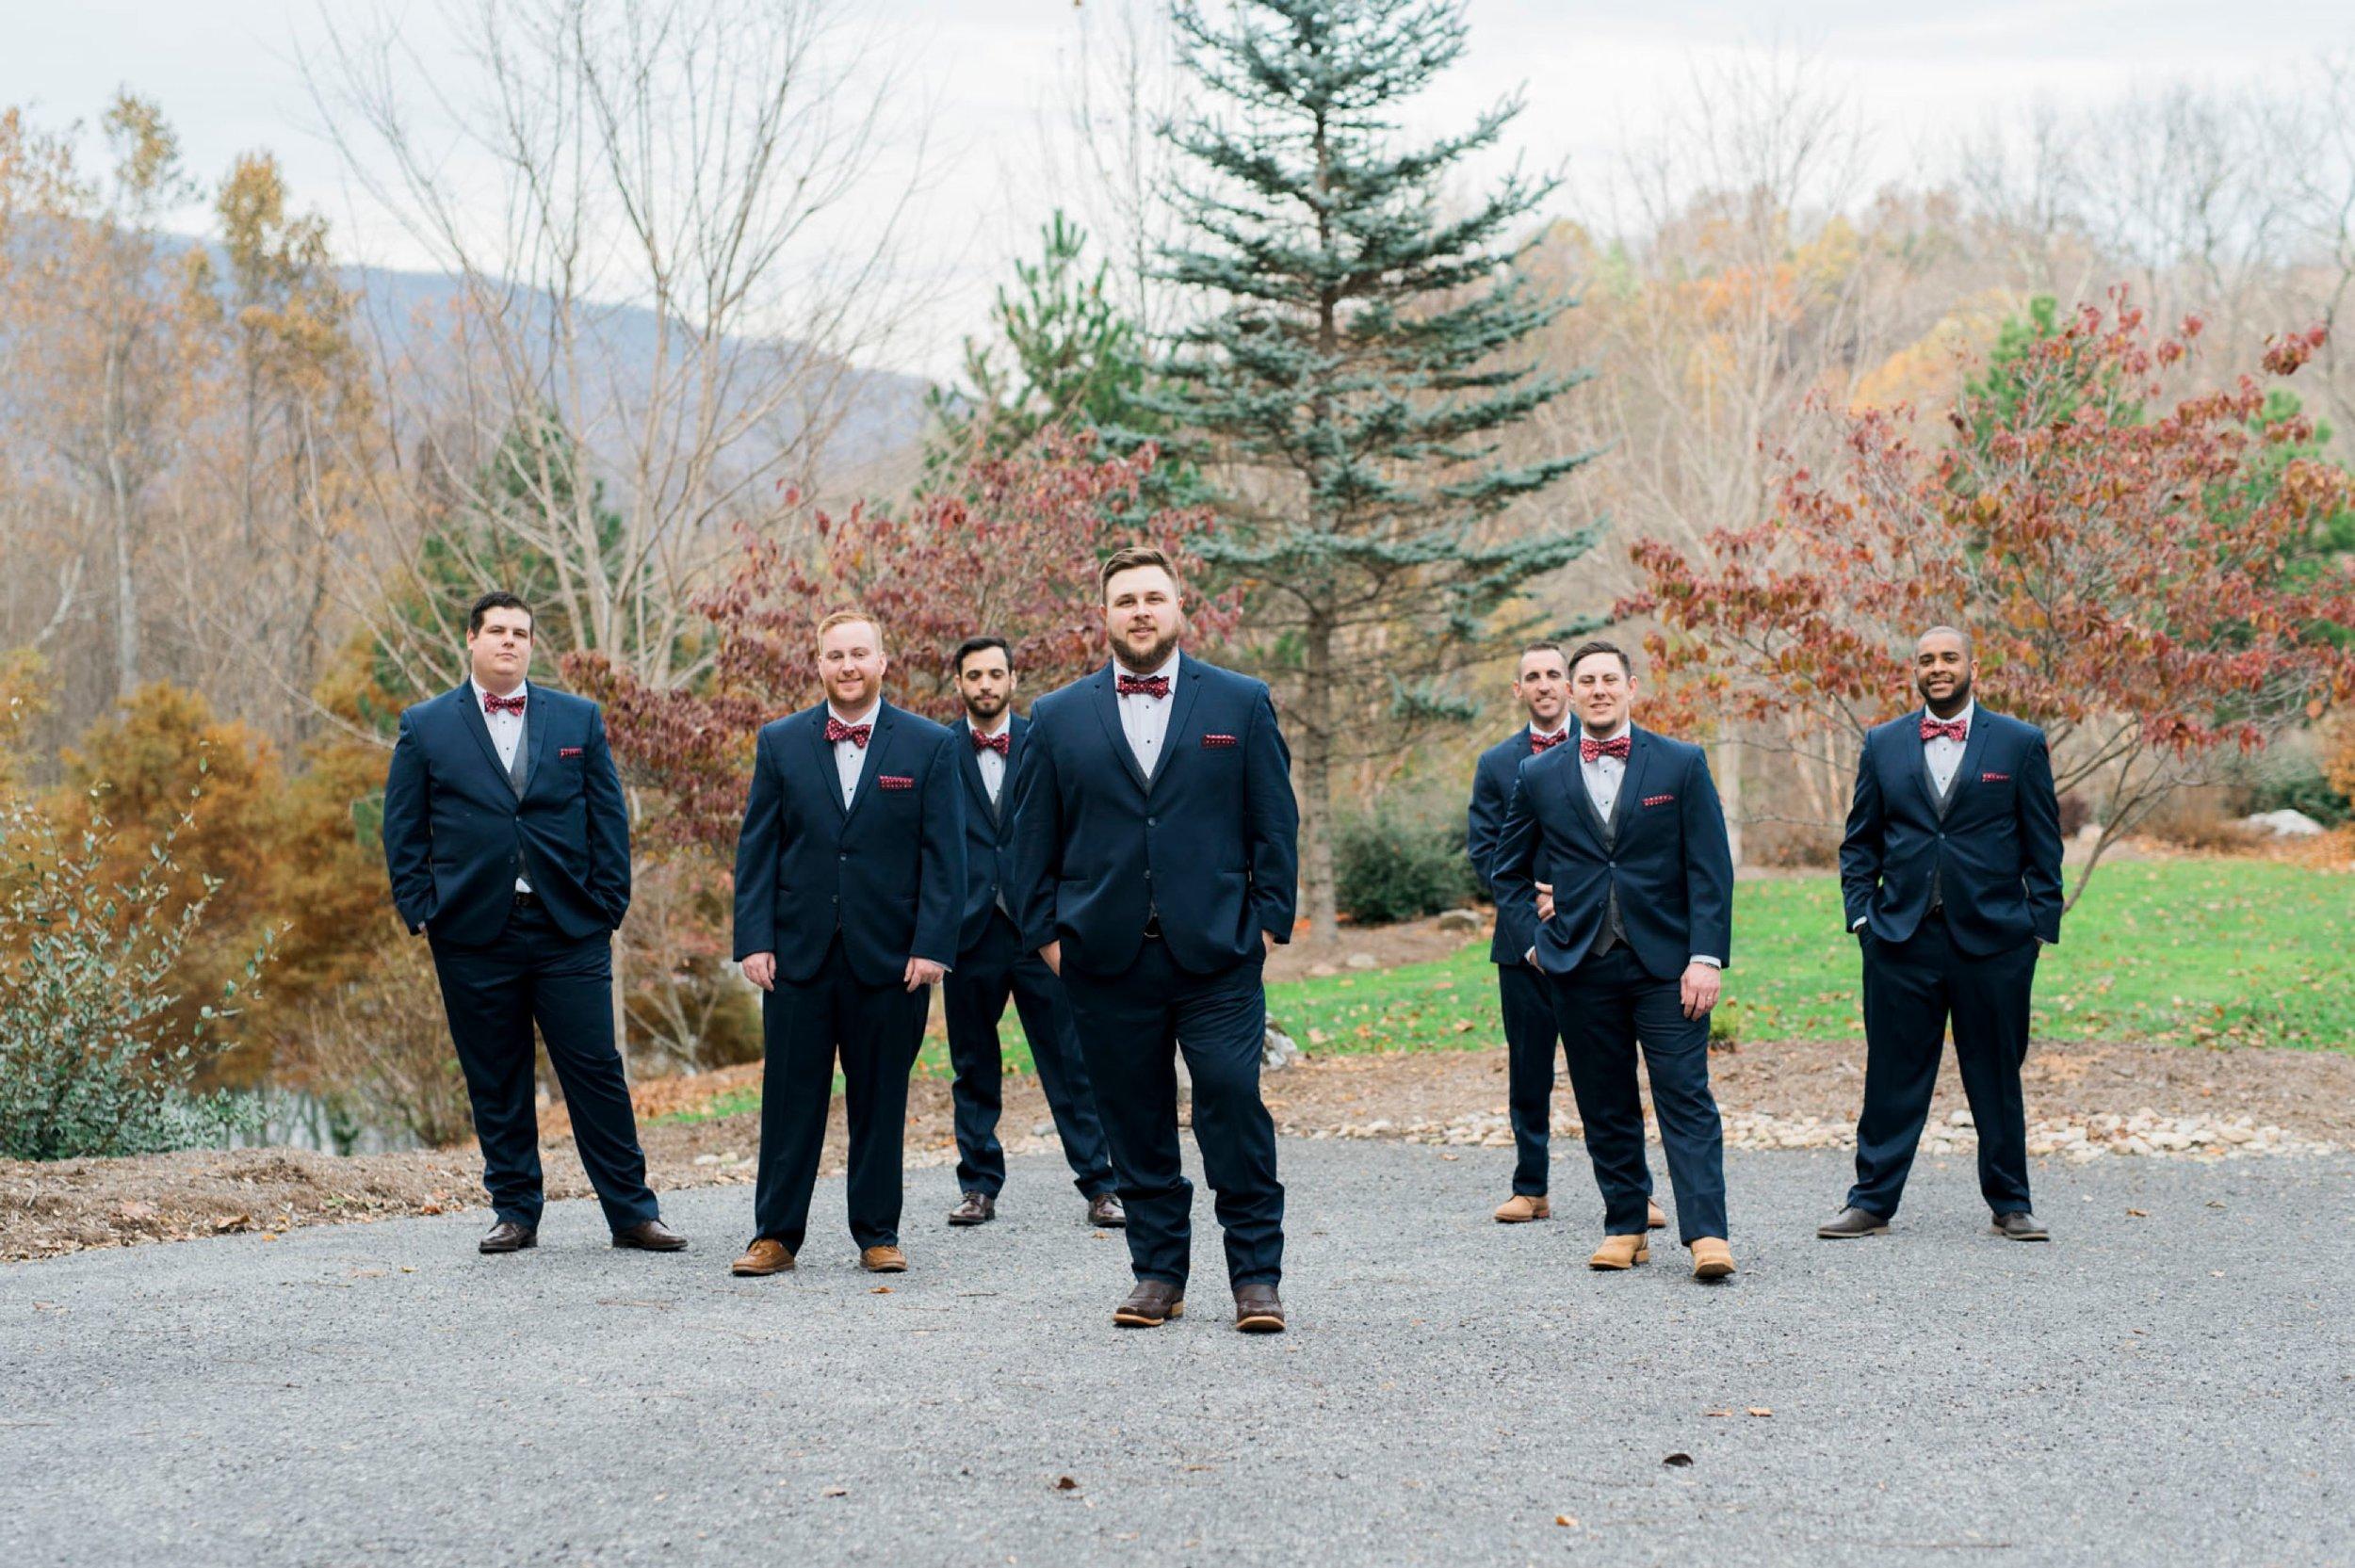 IrvineEstate_LexingtonVA_Wedding_FallWedding_VirginiaWeddingPhotographer 32.jpg